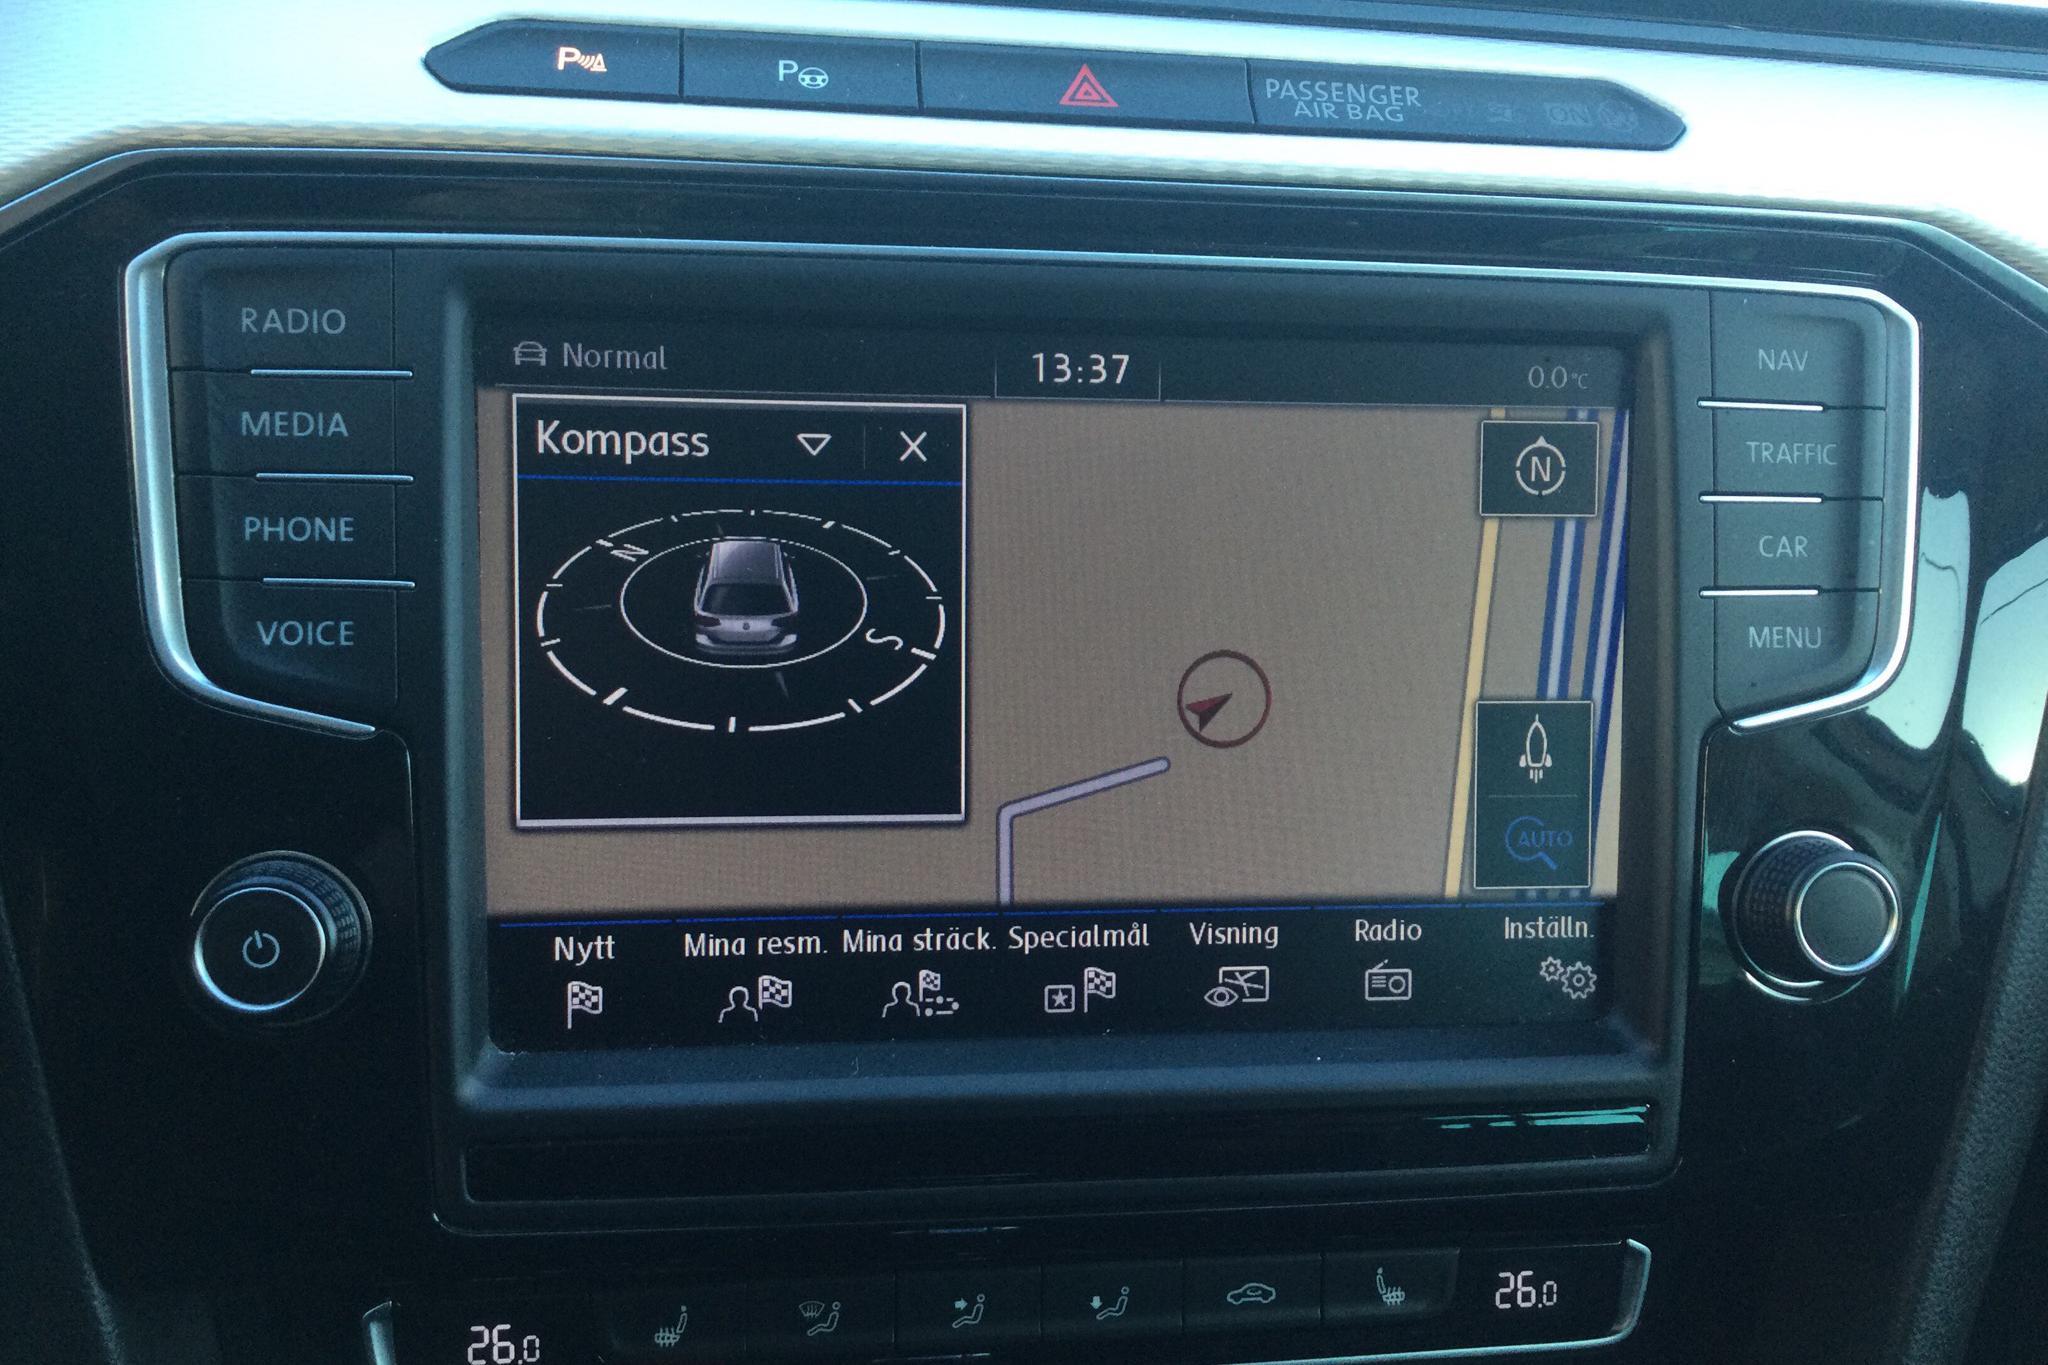 VW Passat 1.4 Plug-in-Hybrid Sportscombi (218hk) - 8 703 mil - Automat - vit - 2016